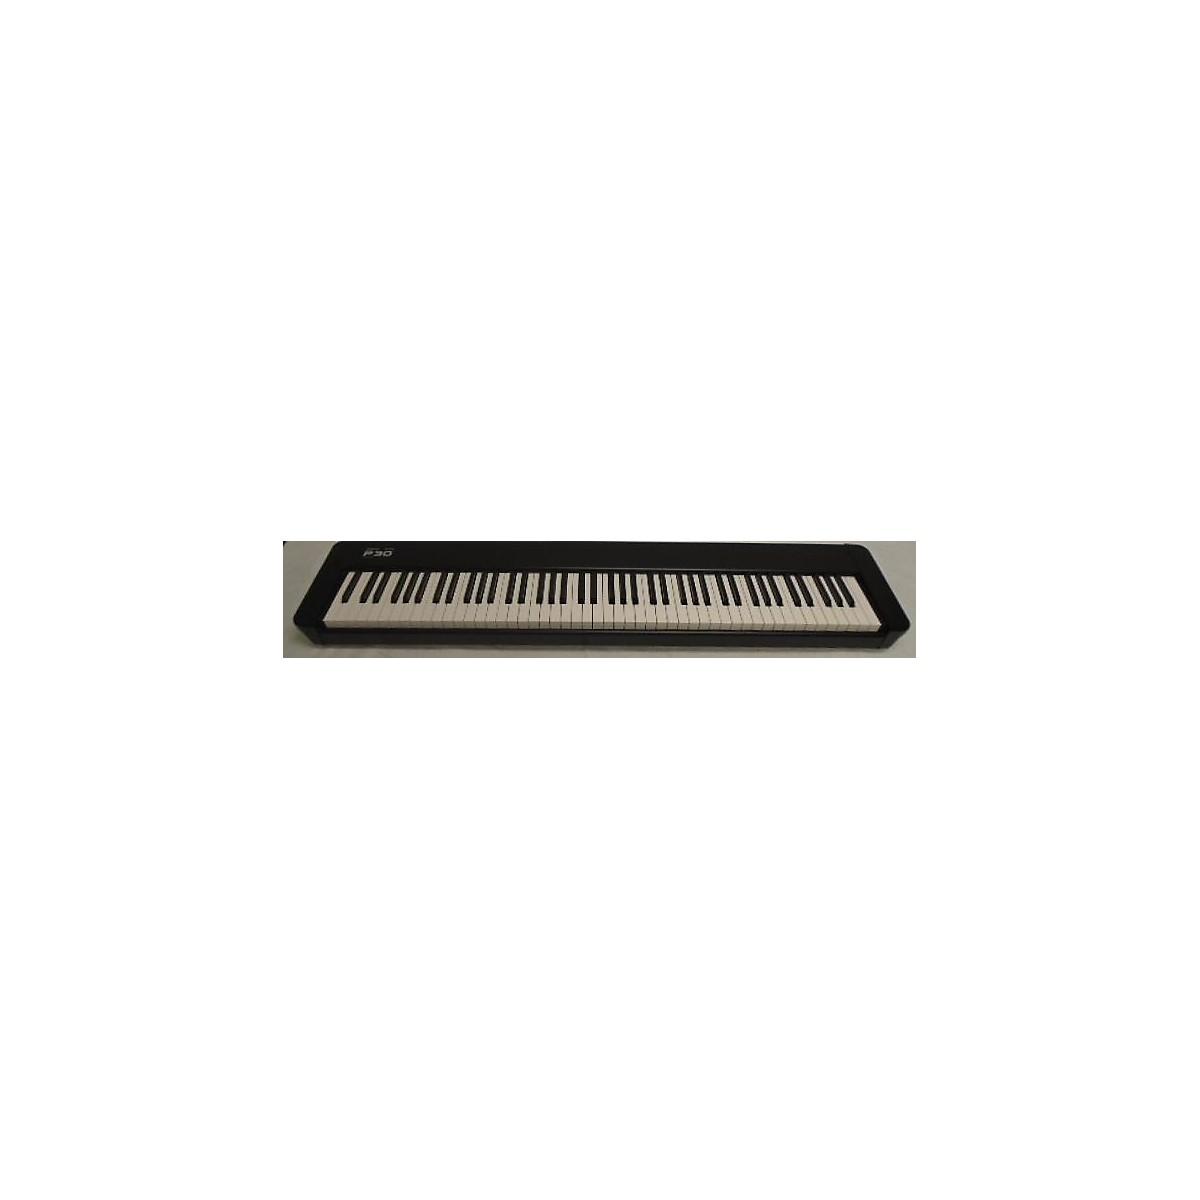 Technics SX-P30 Digital Piano